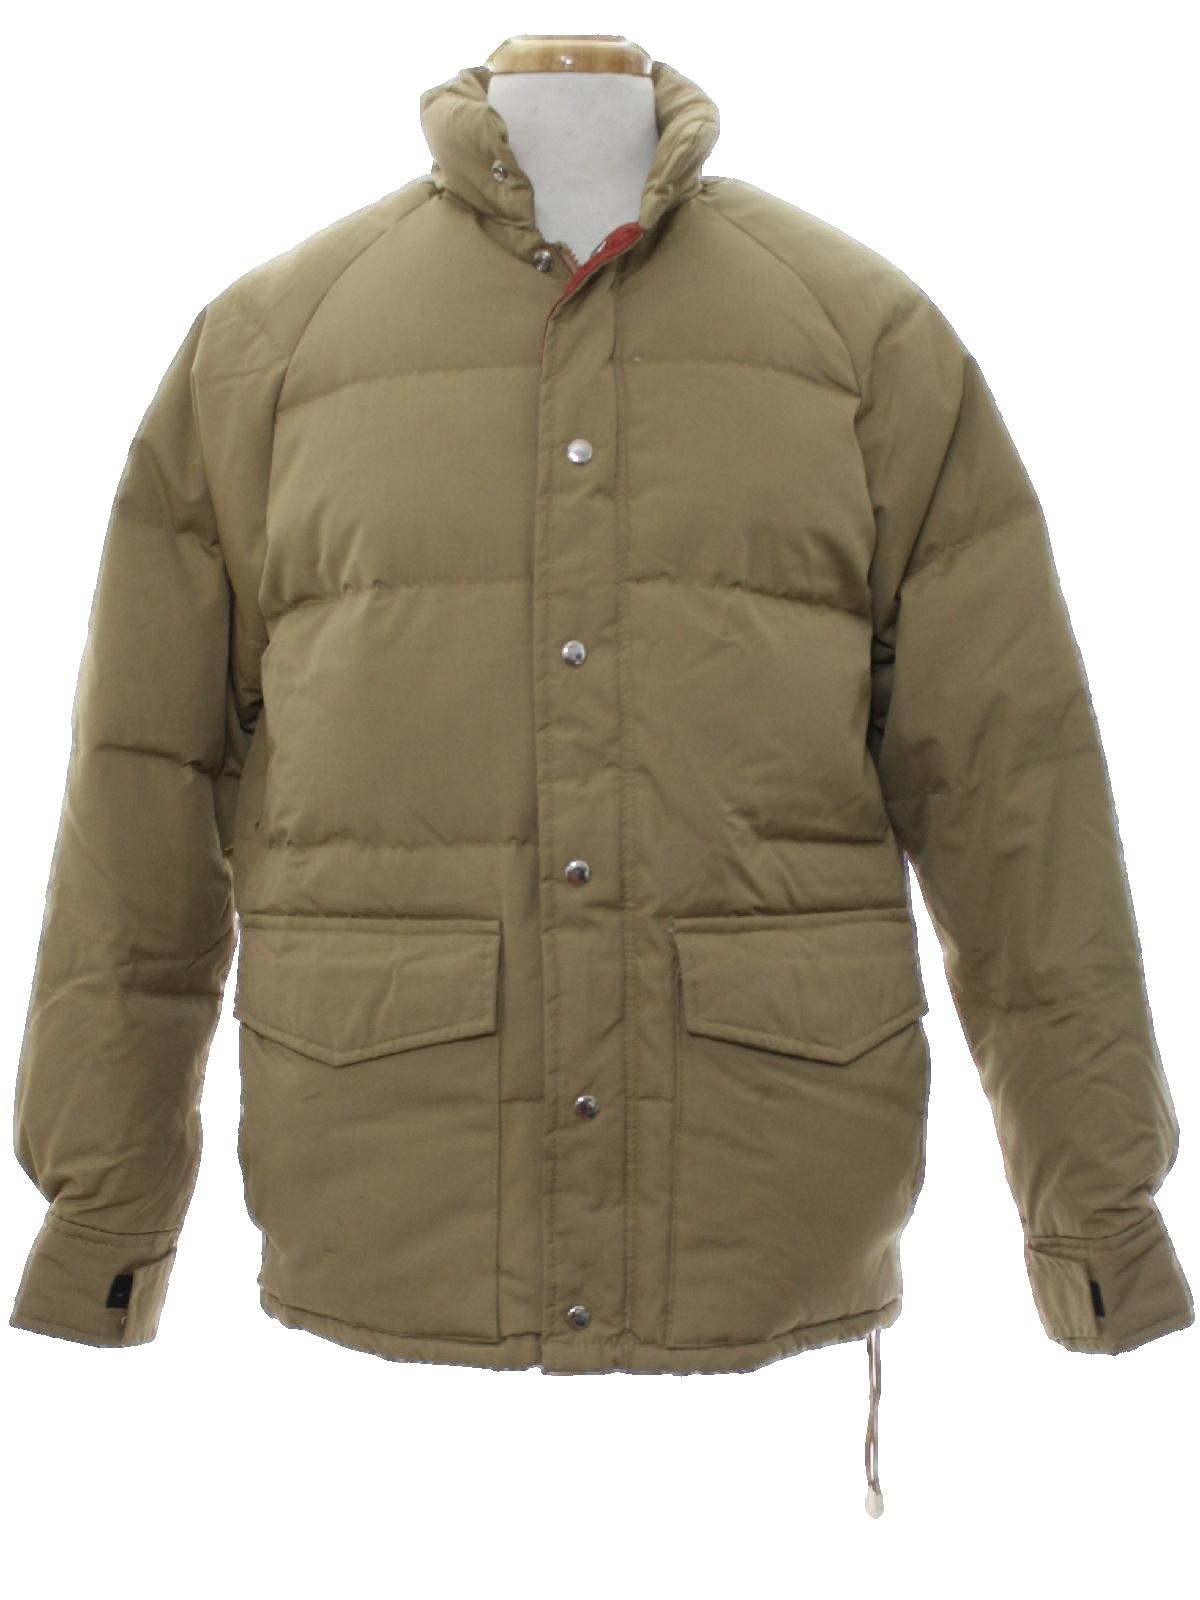 Christopher Rand 80 S Vintage Jacket 80s Christopher